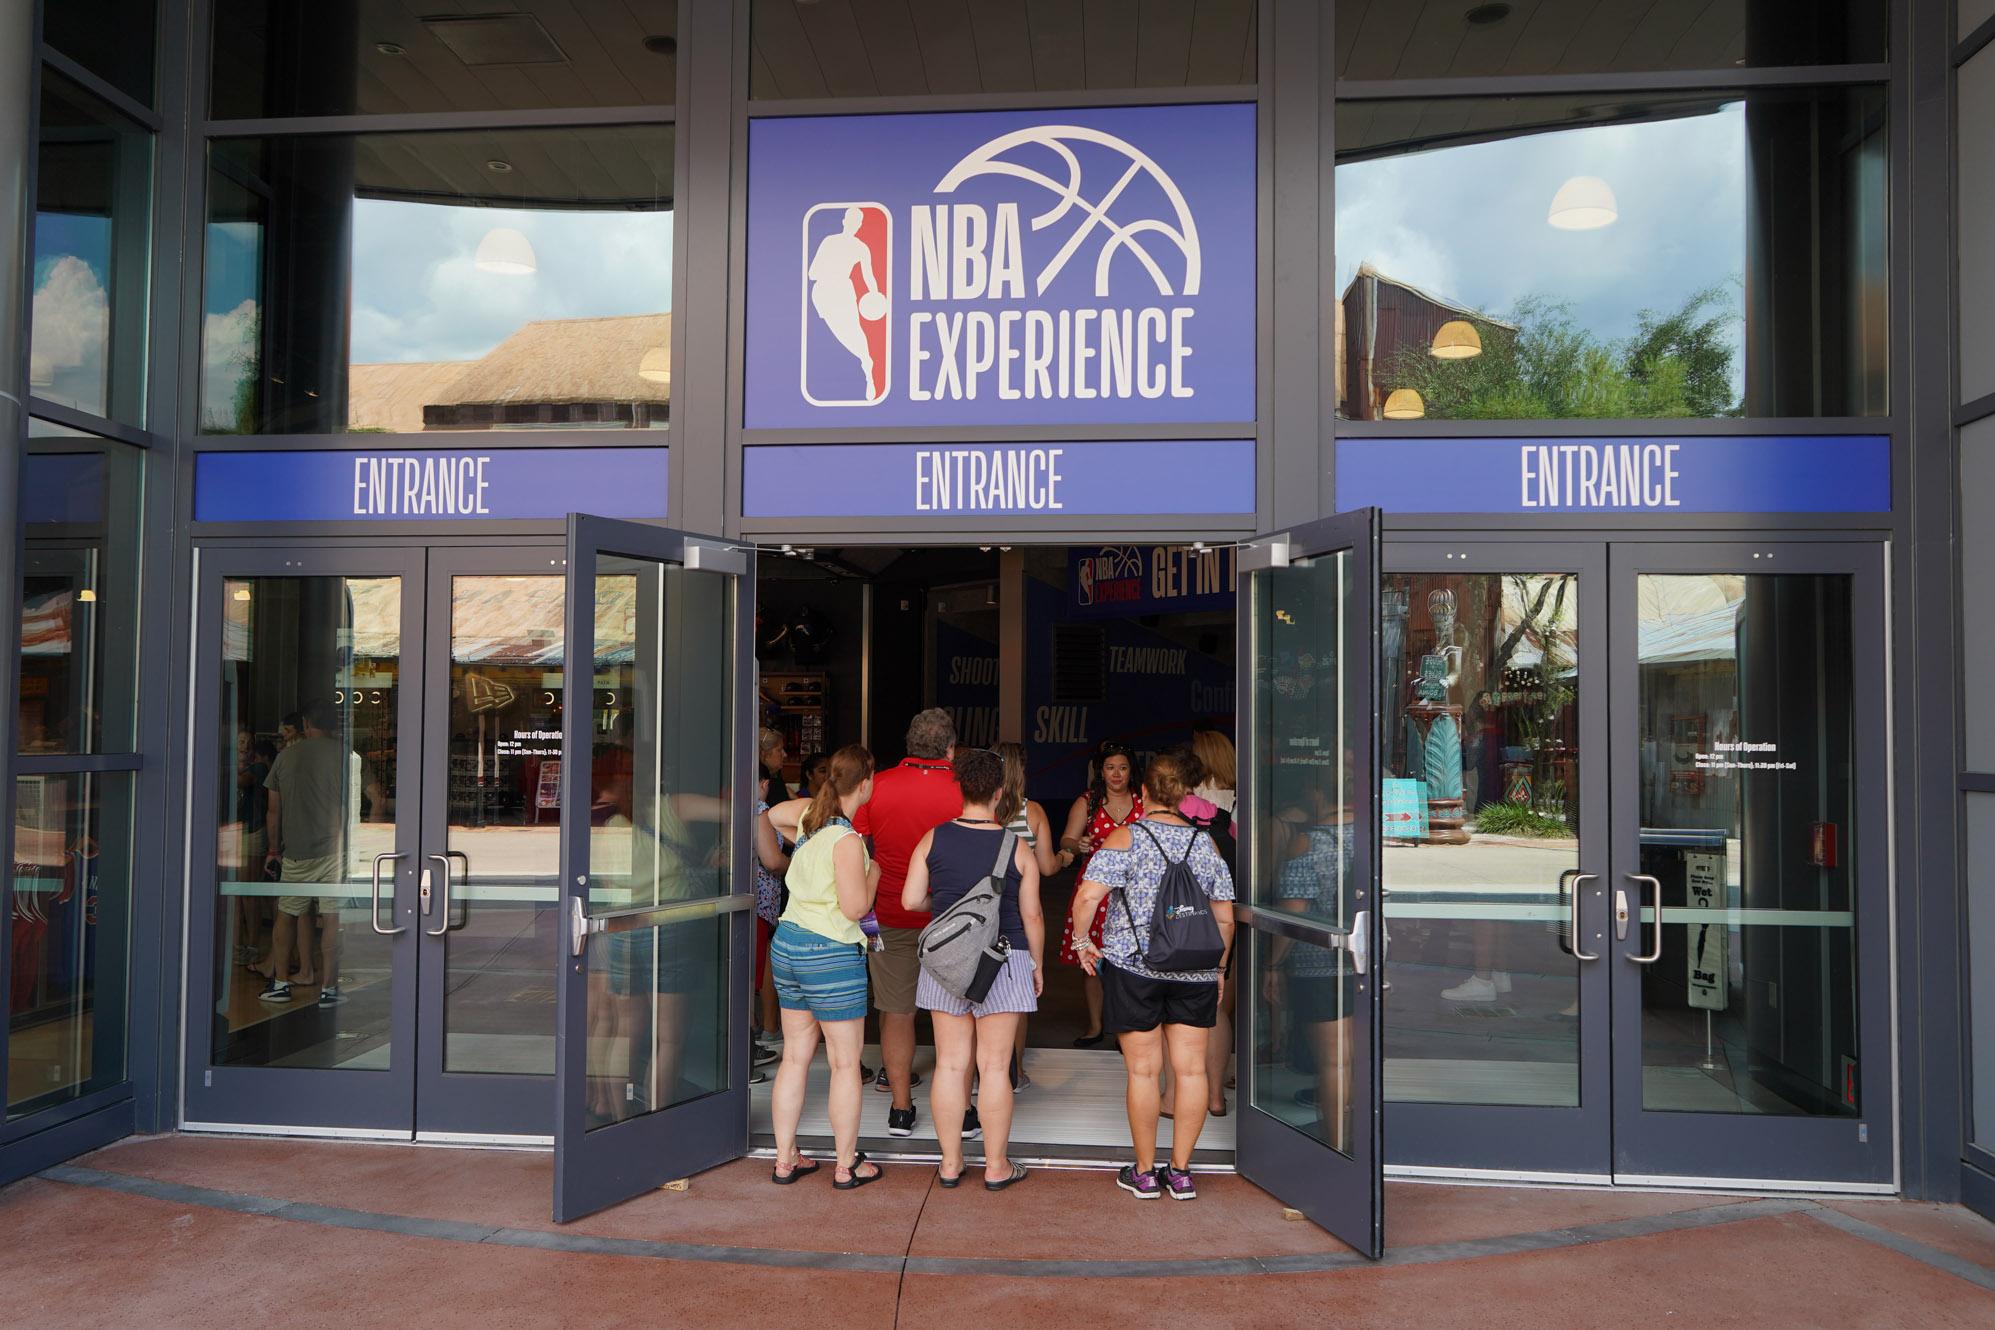 NBA Experience at Disney World